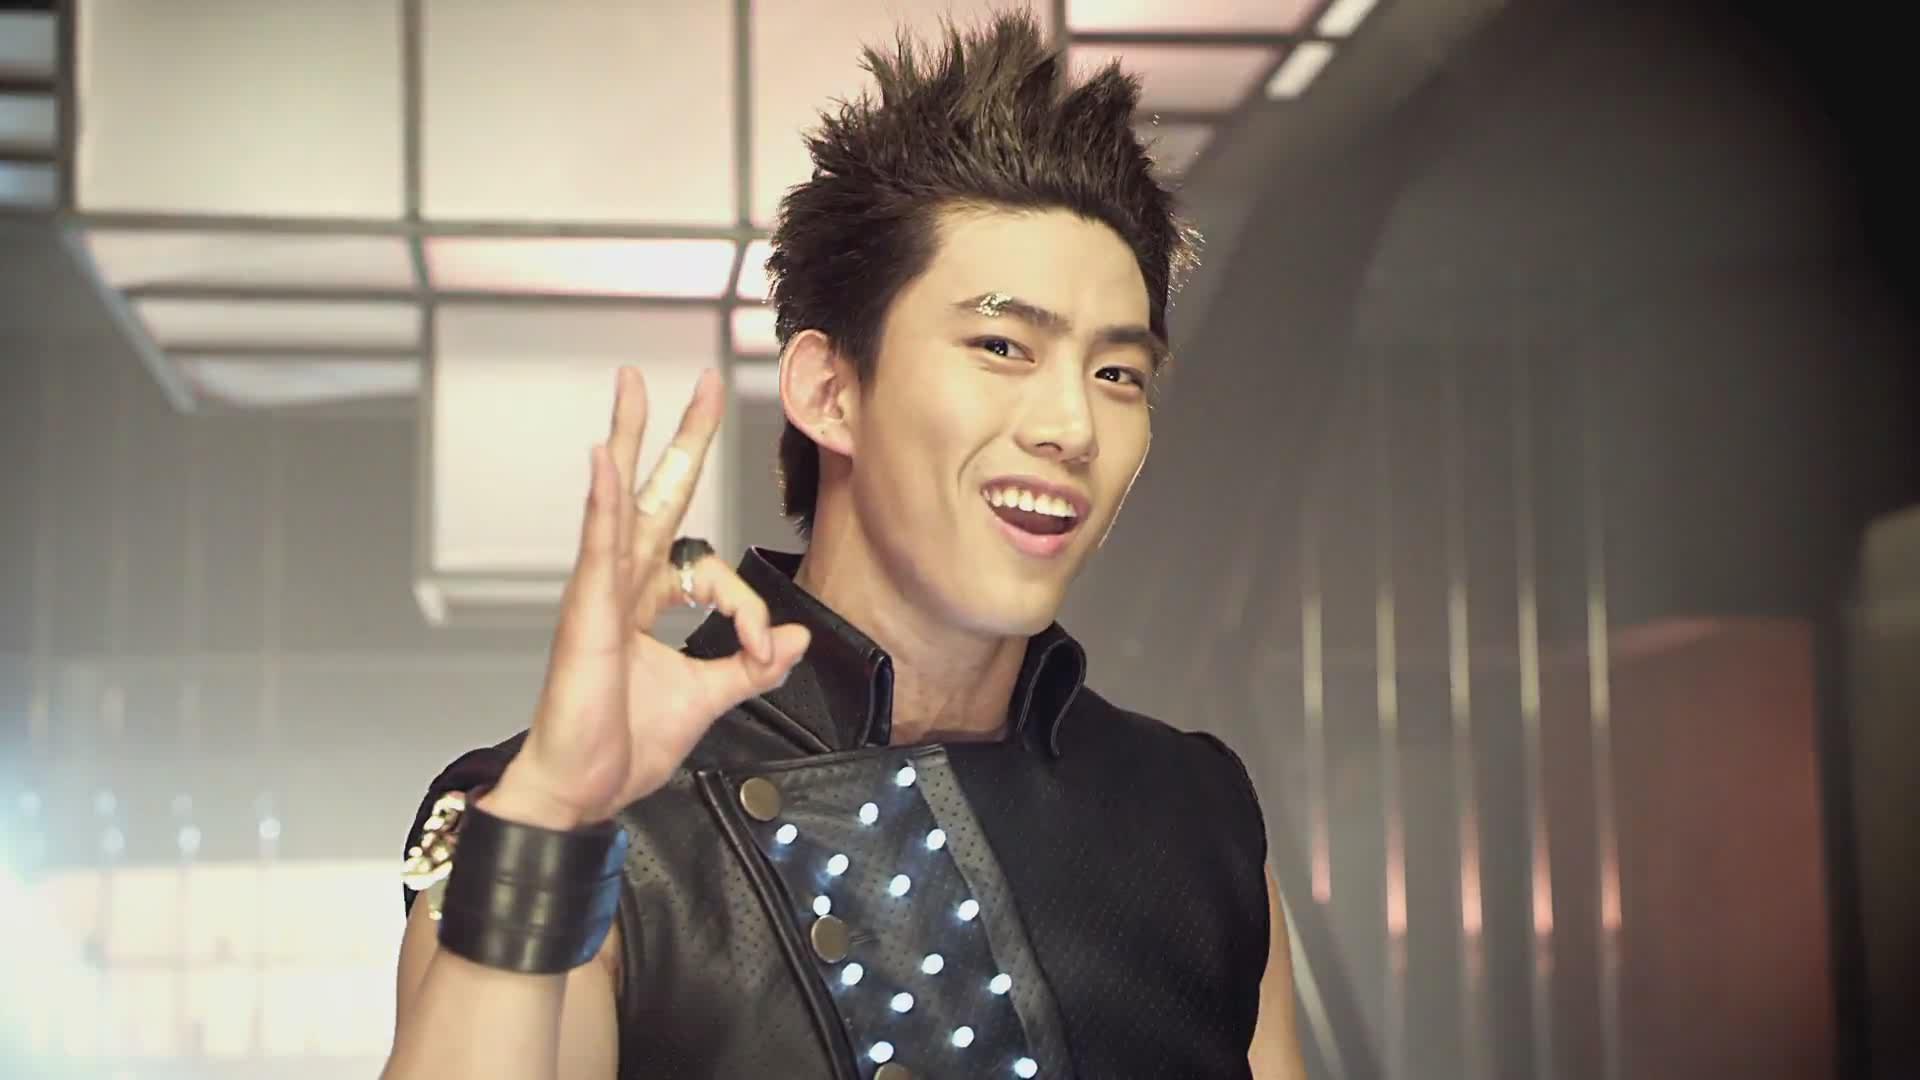 2PM's Taecyeon Is One Hot Nerd